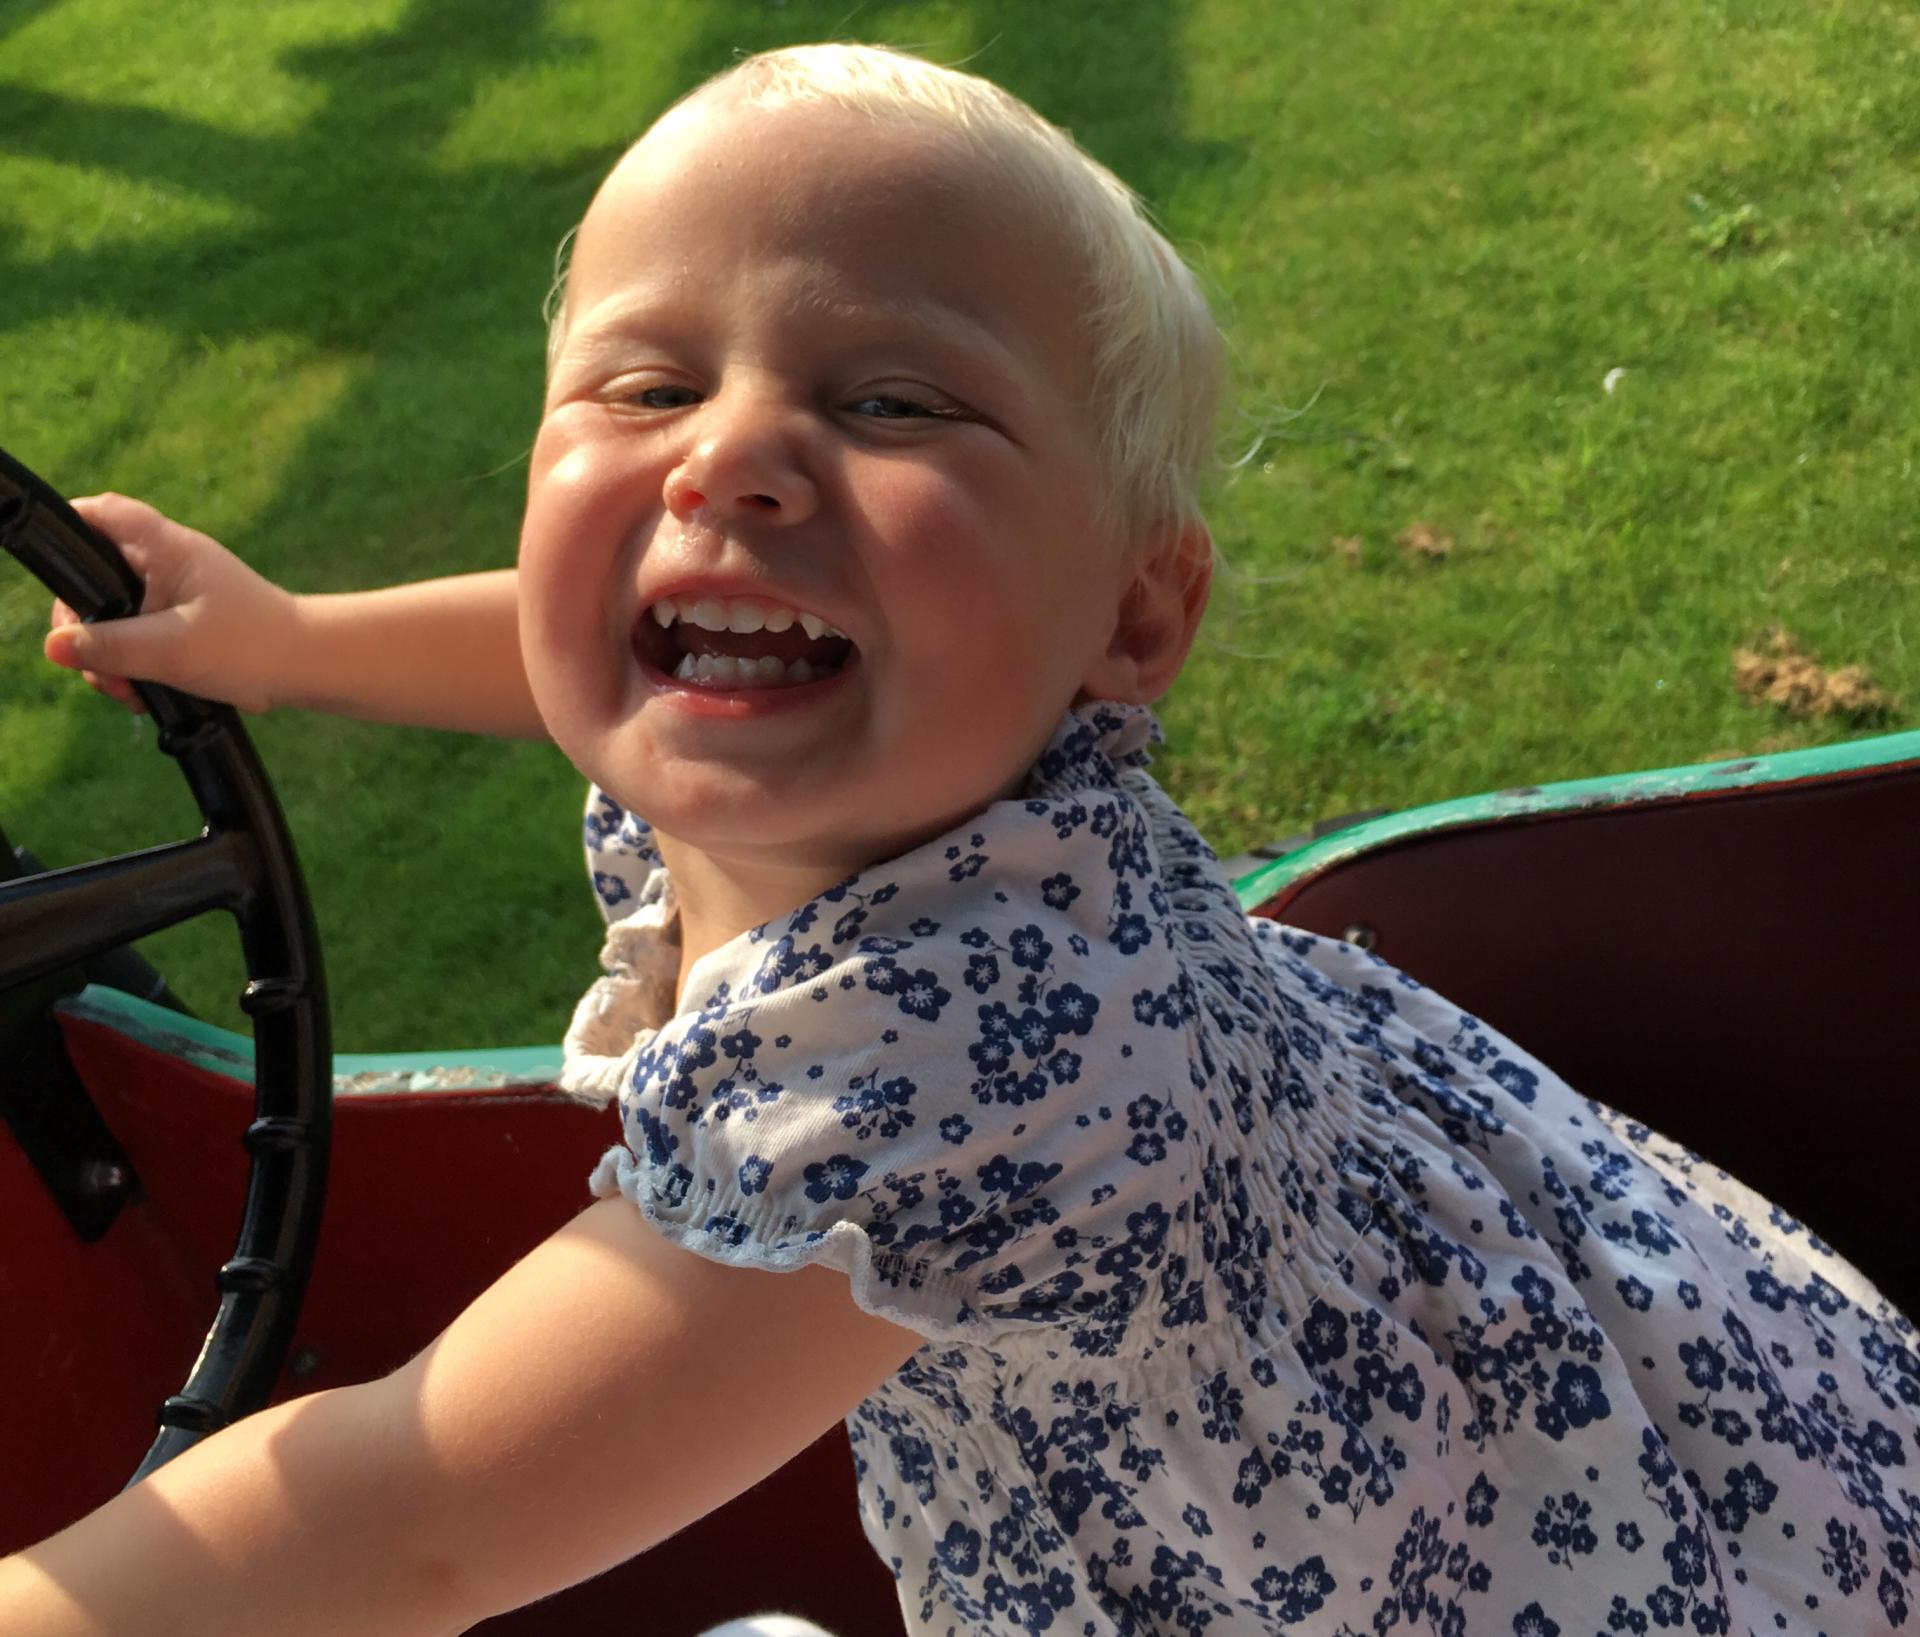 zara enjoying the ride